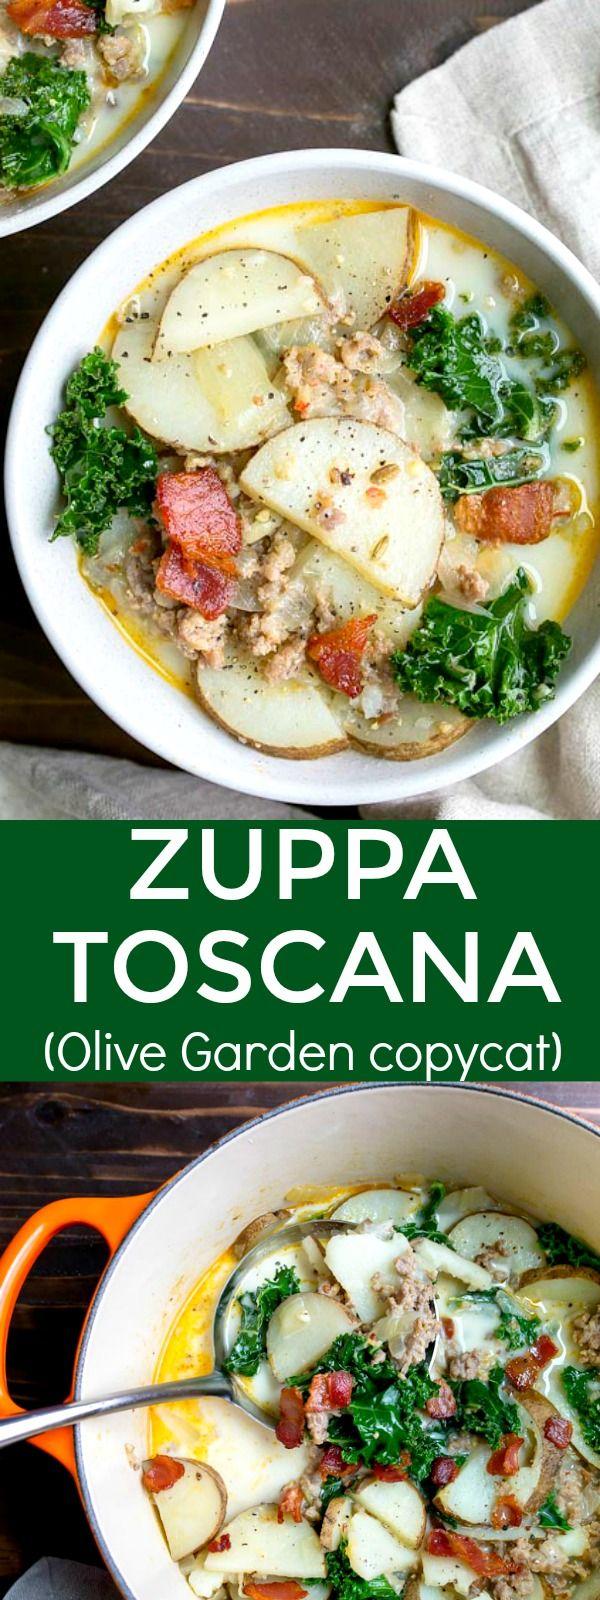 Zuppa Toscana soup recipe, a copycat Olive Garden soup with potatoes, kale, bacon, and sausage. Creamy potato soup made with bacon, sausage and kale that tastes just like Olive Garden's Zupa Toscana soup! via @dessertfortwo #zuppatoscanasoup